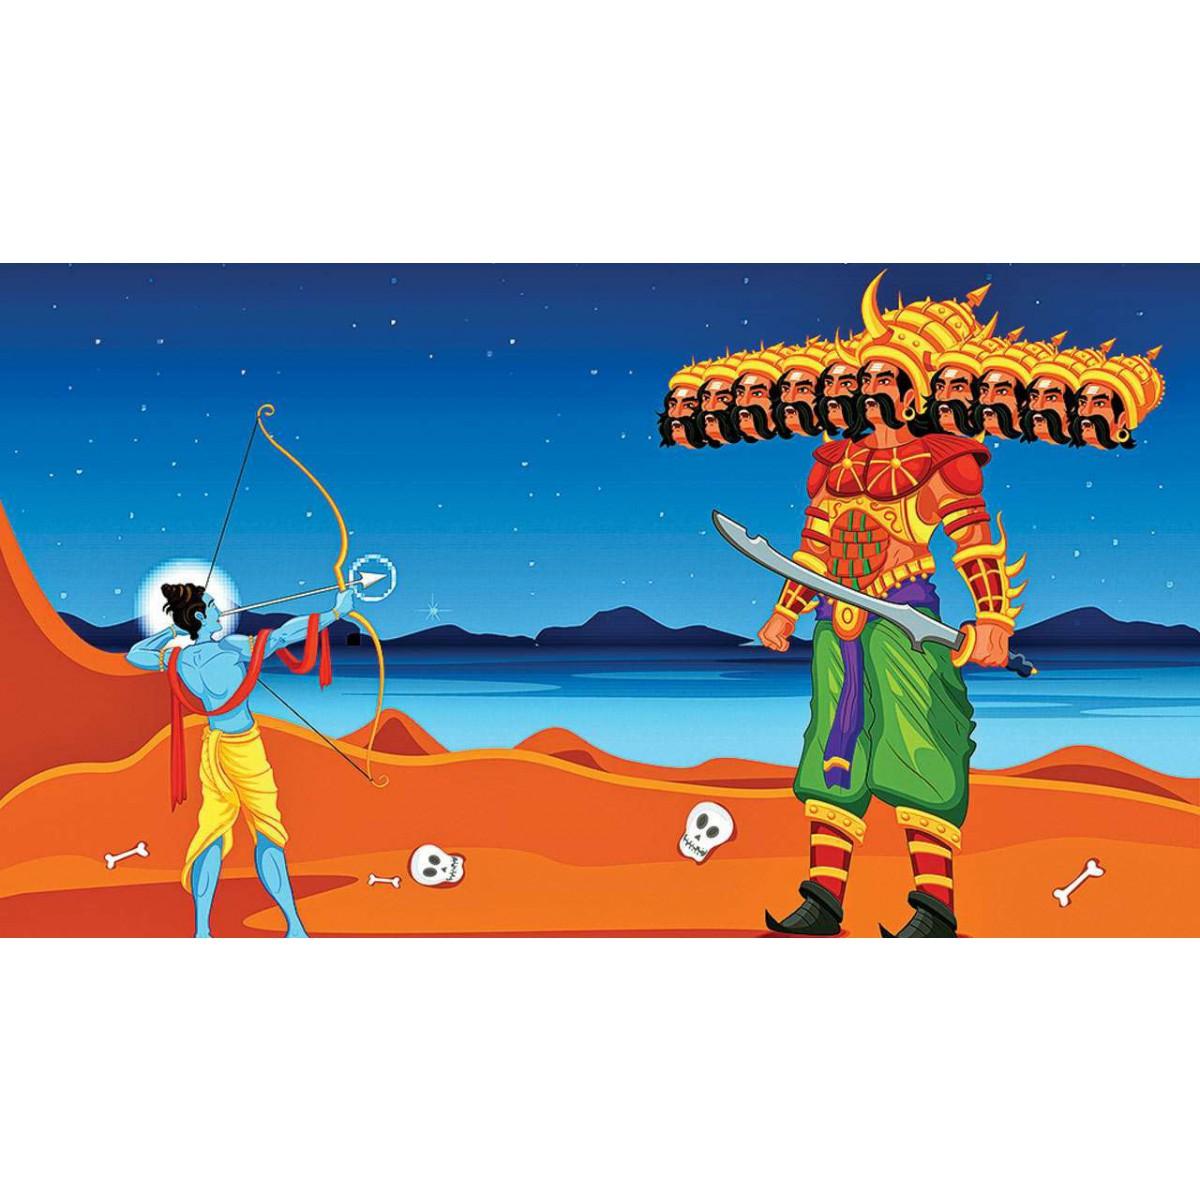 Dasara Festival 2020.Dussehra 2020 When Is Dussehra 2020 Calendarz